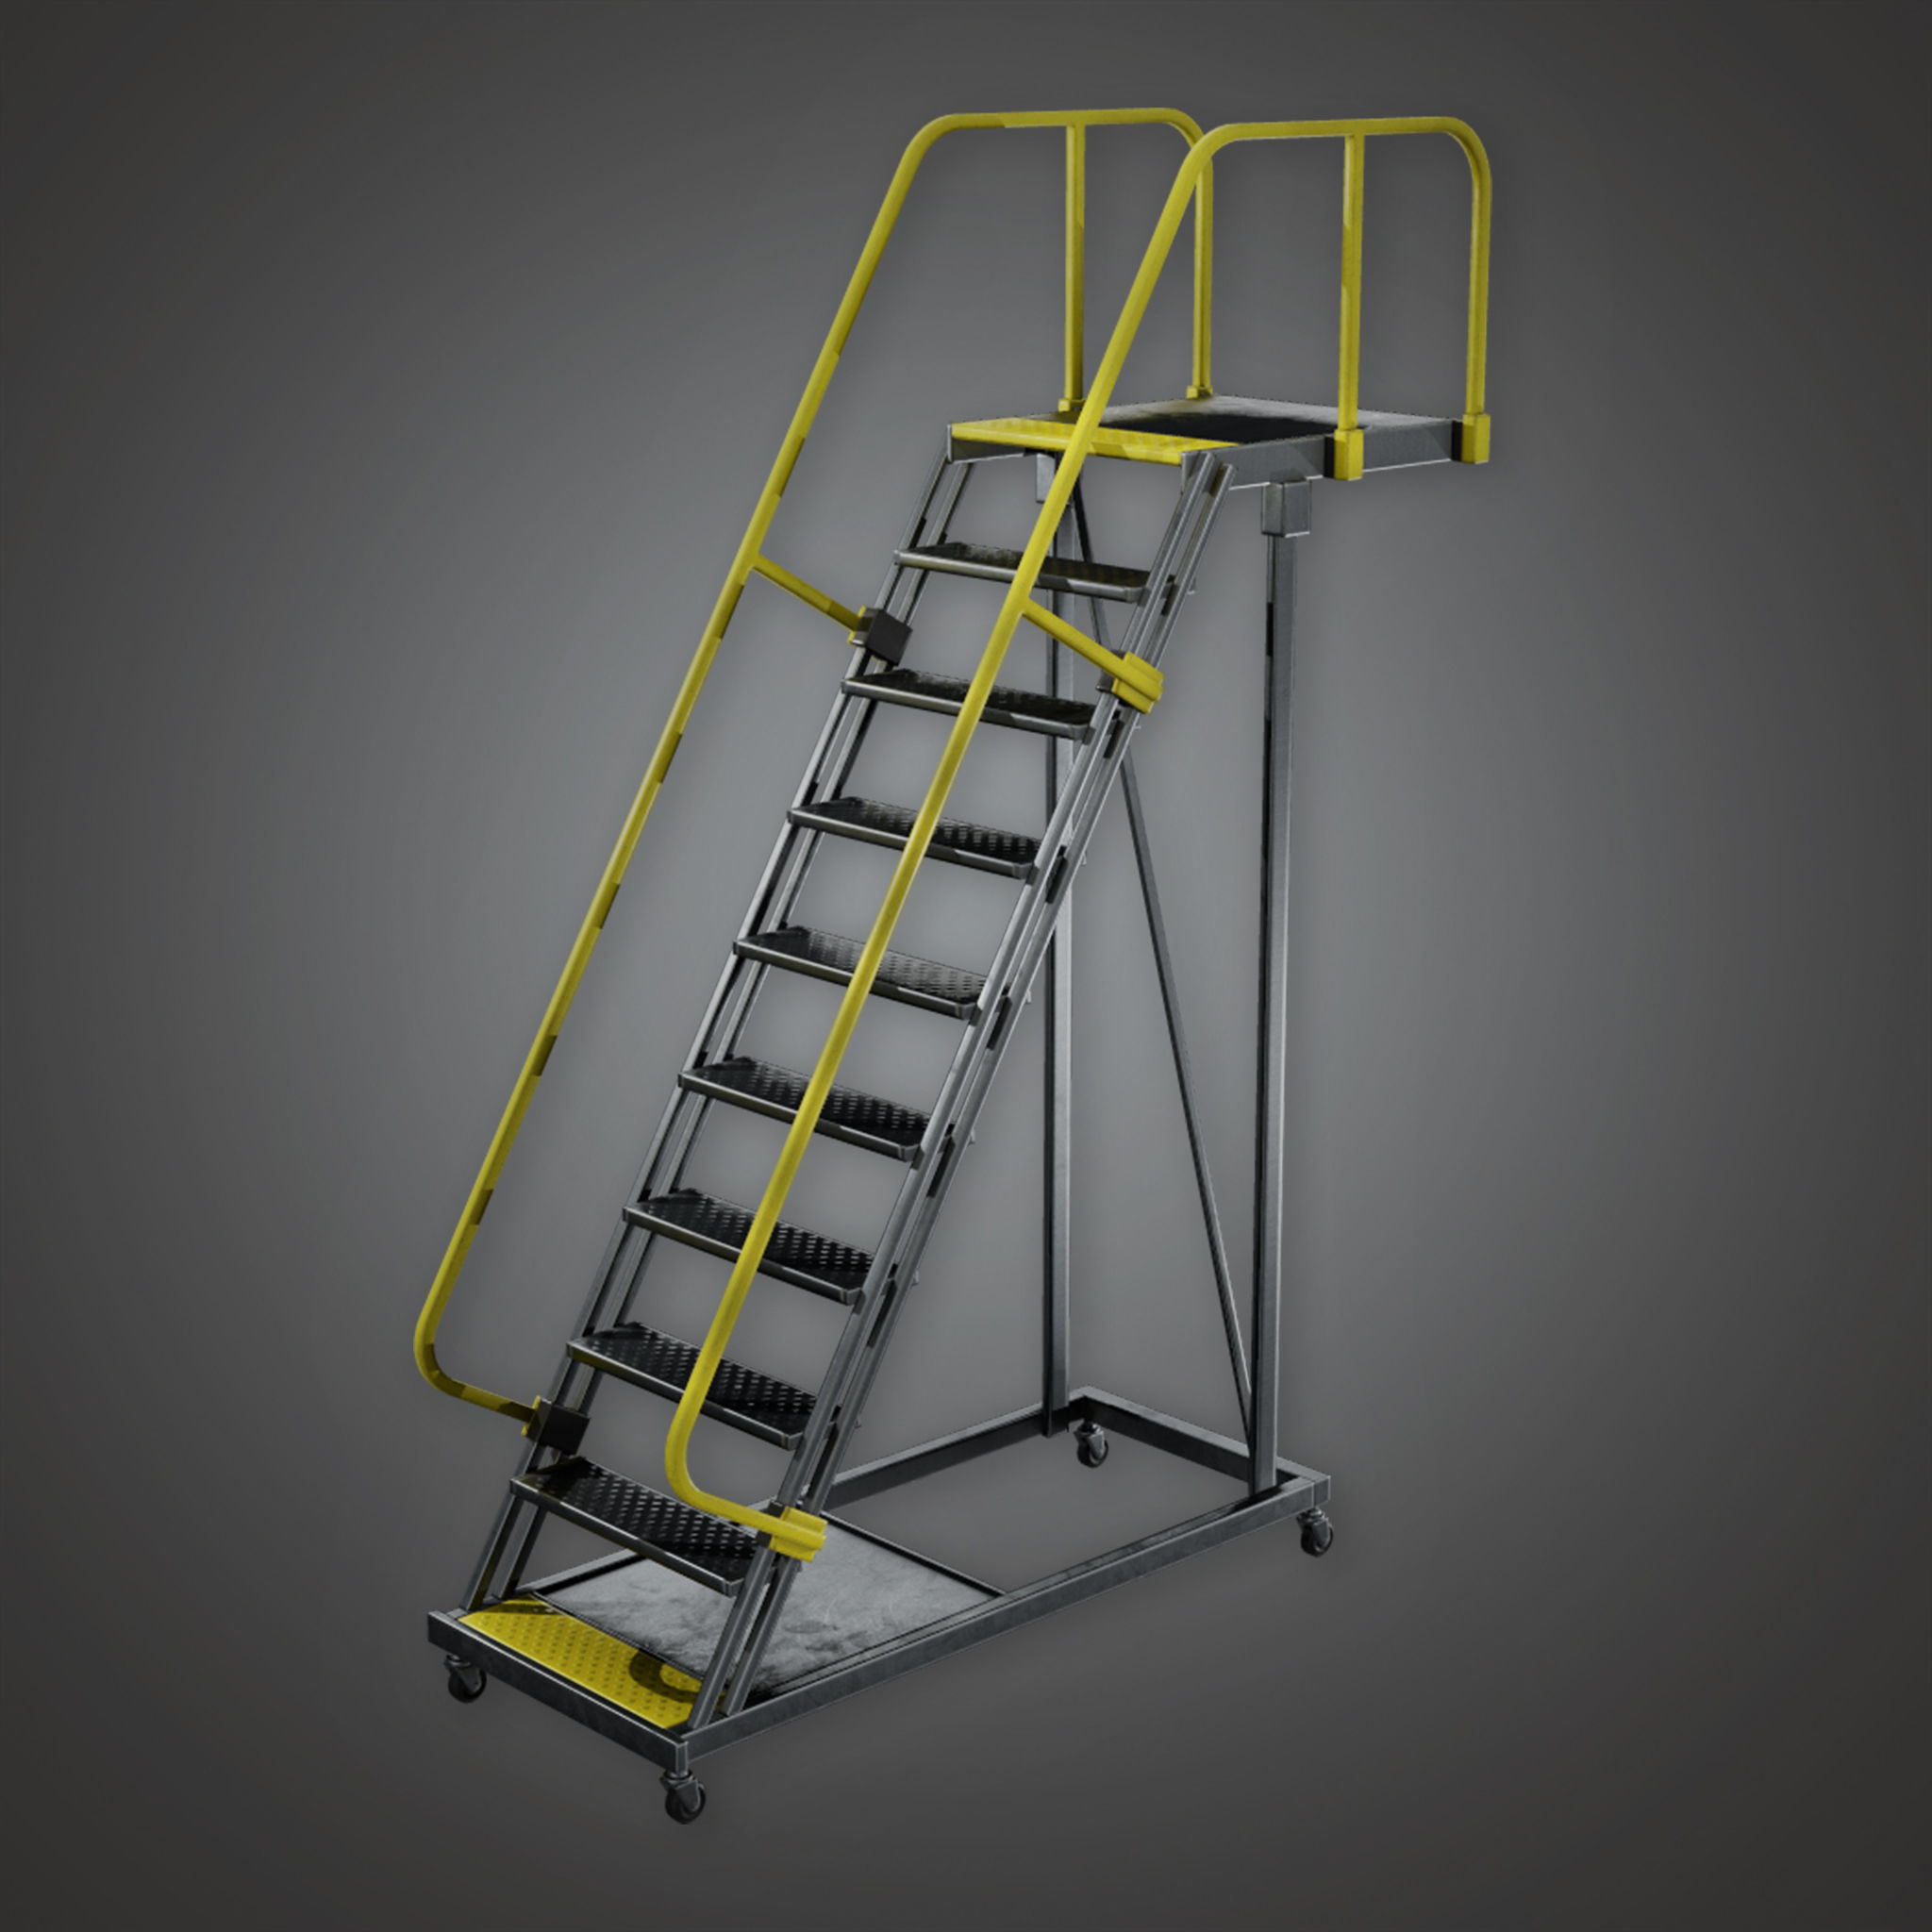 HLW - Standing Rail Ladder - PBR Game Ready